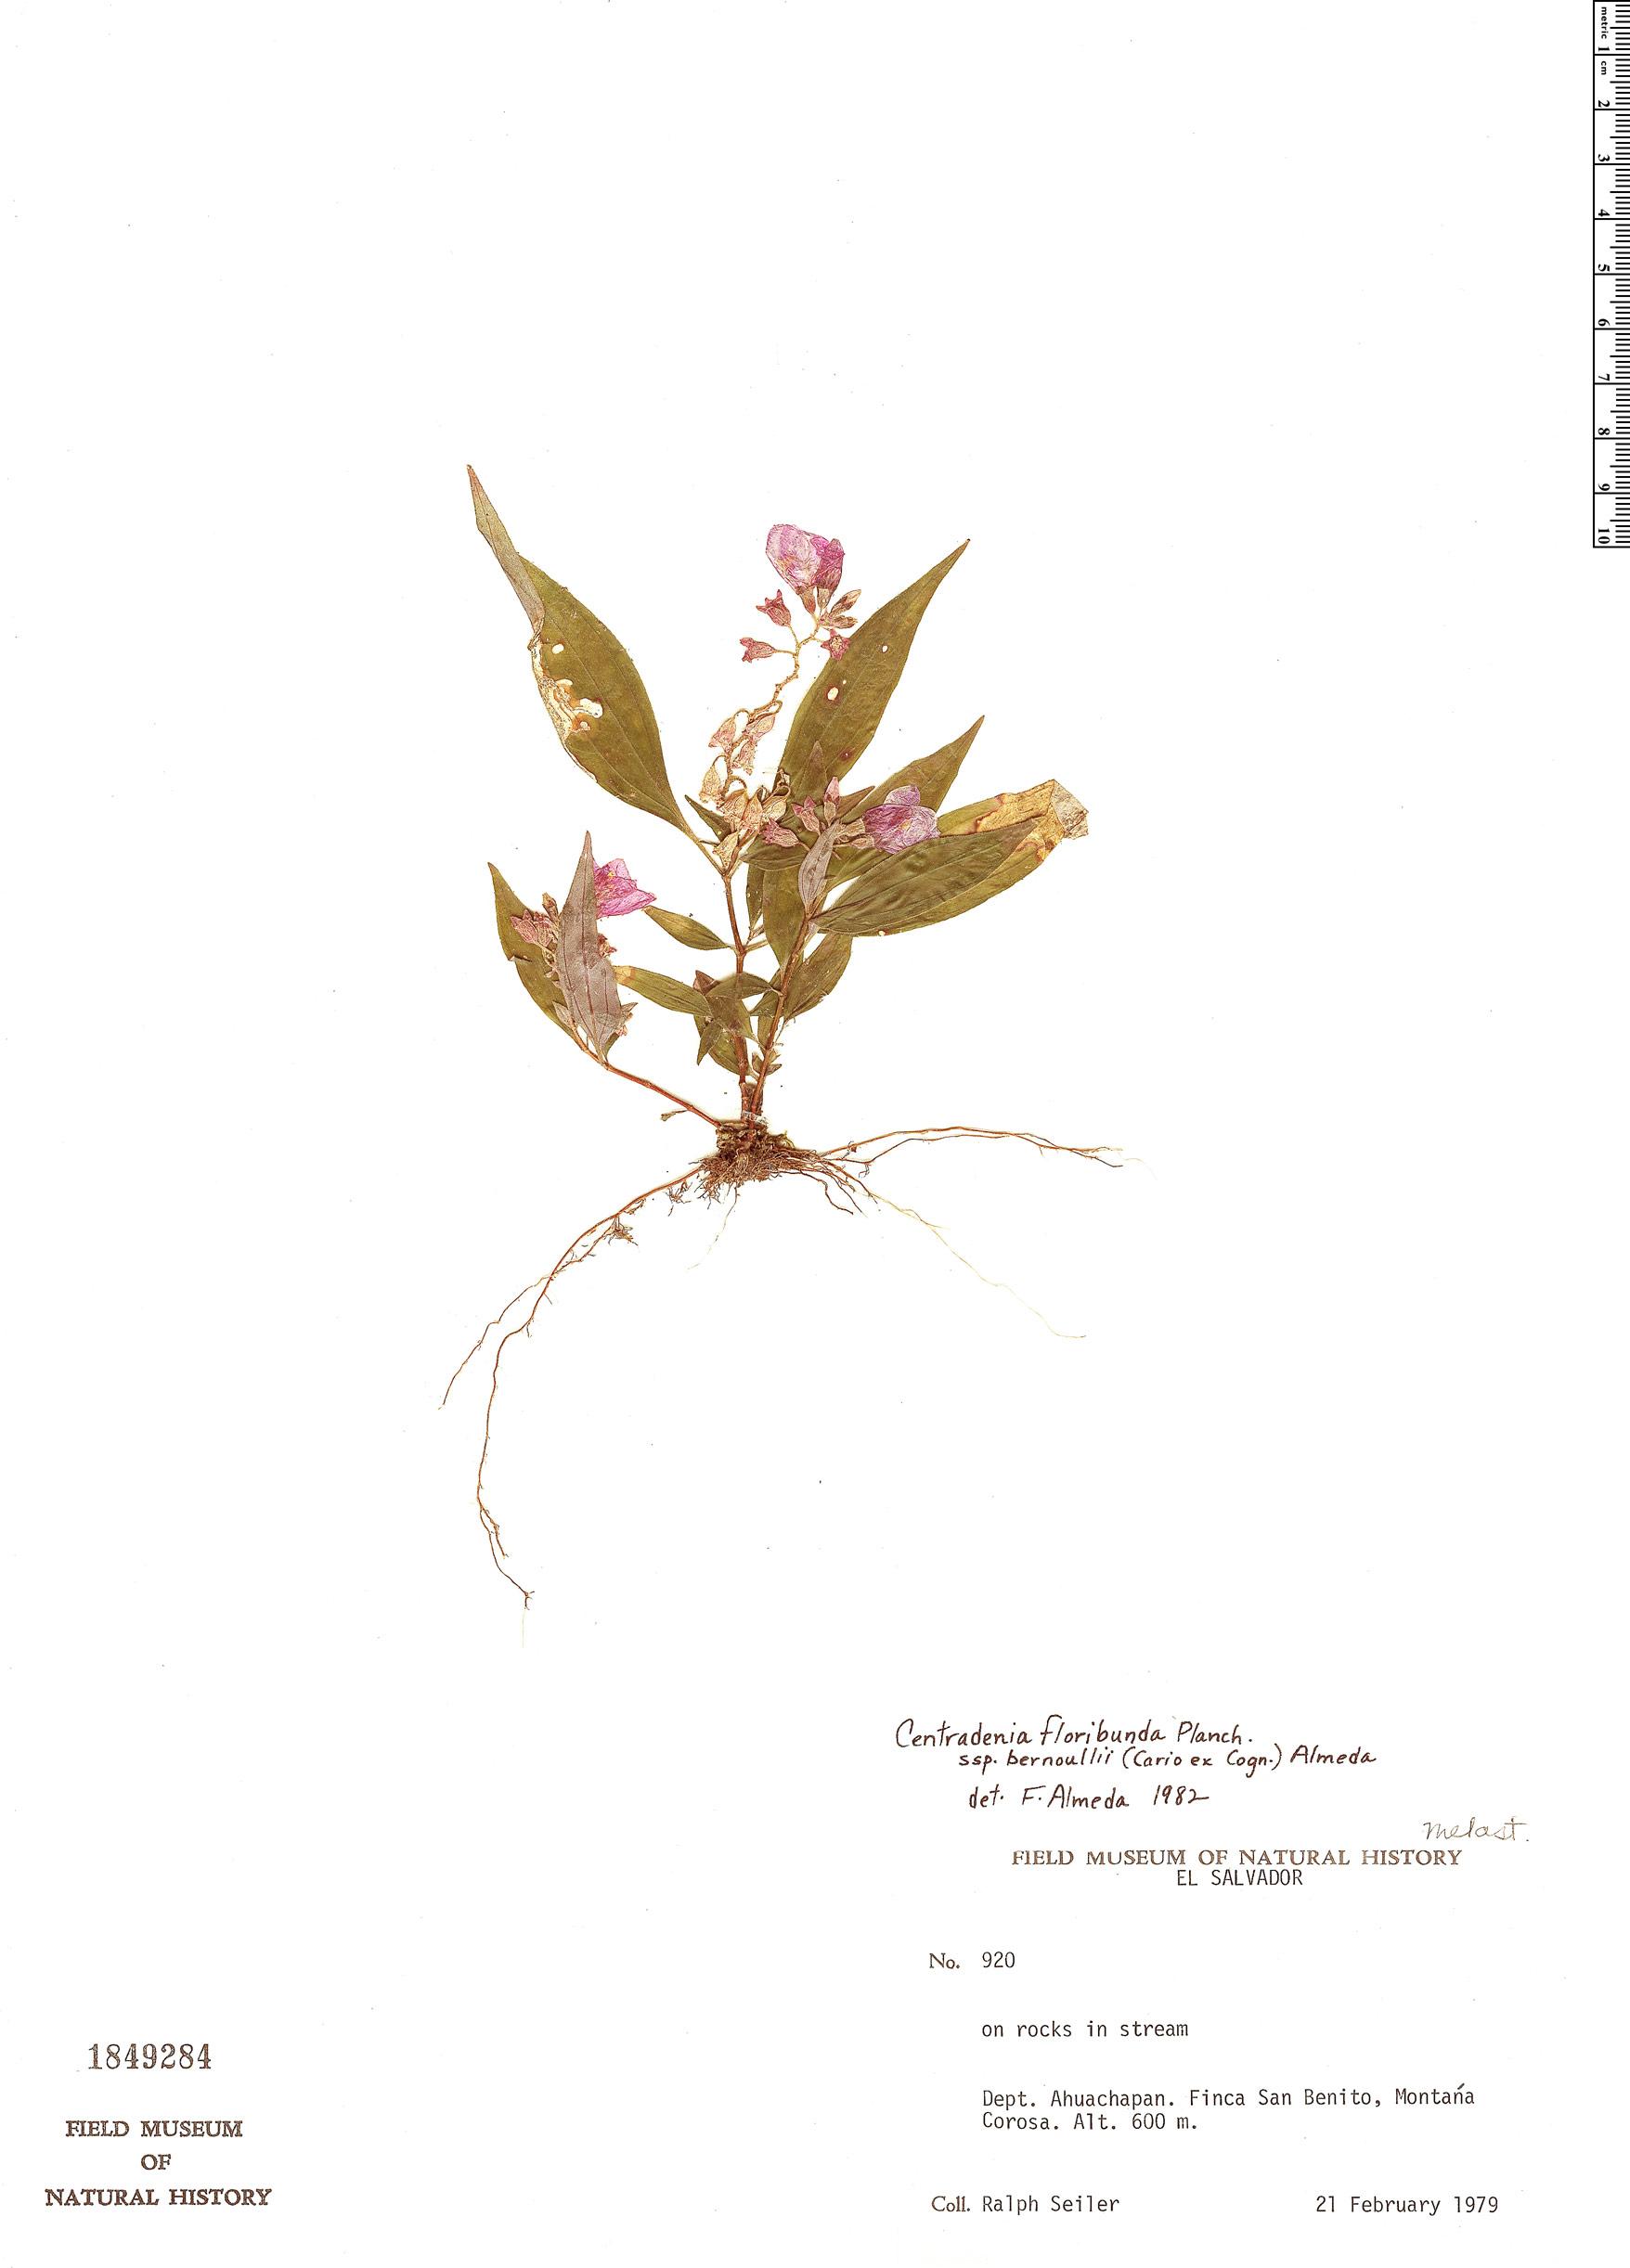 Specimen: Centradenia floribunda